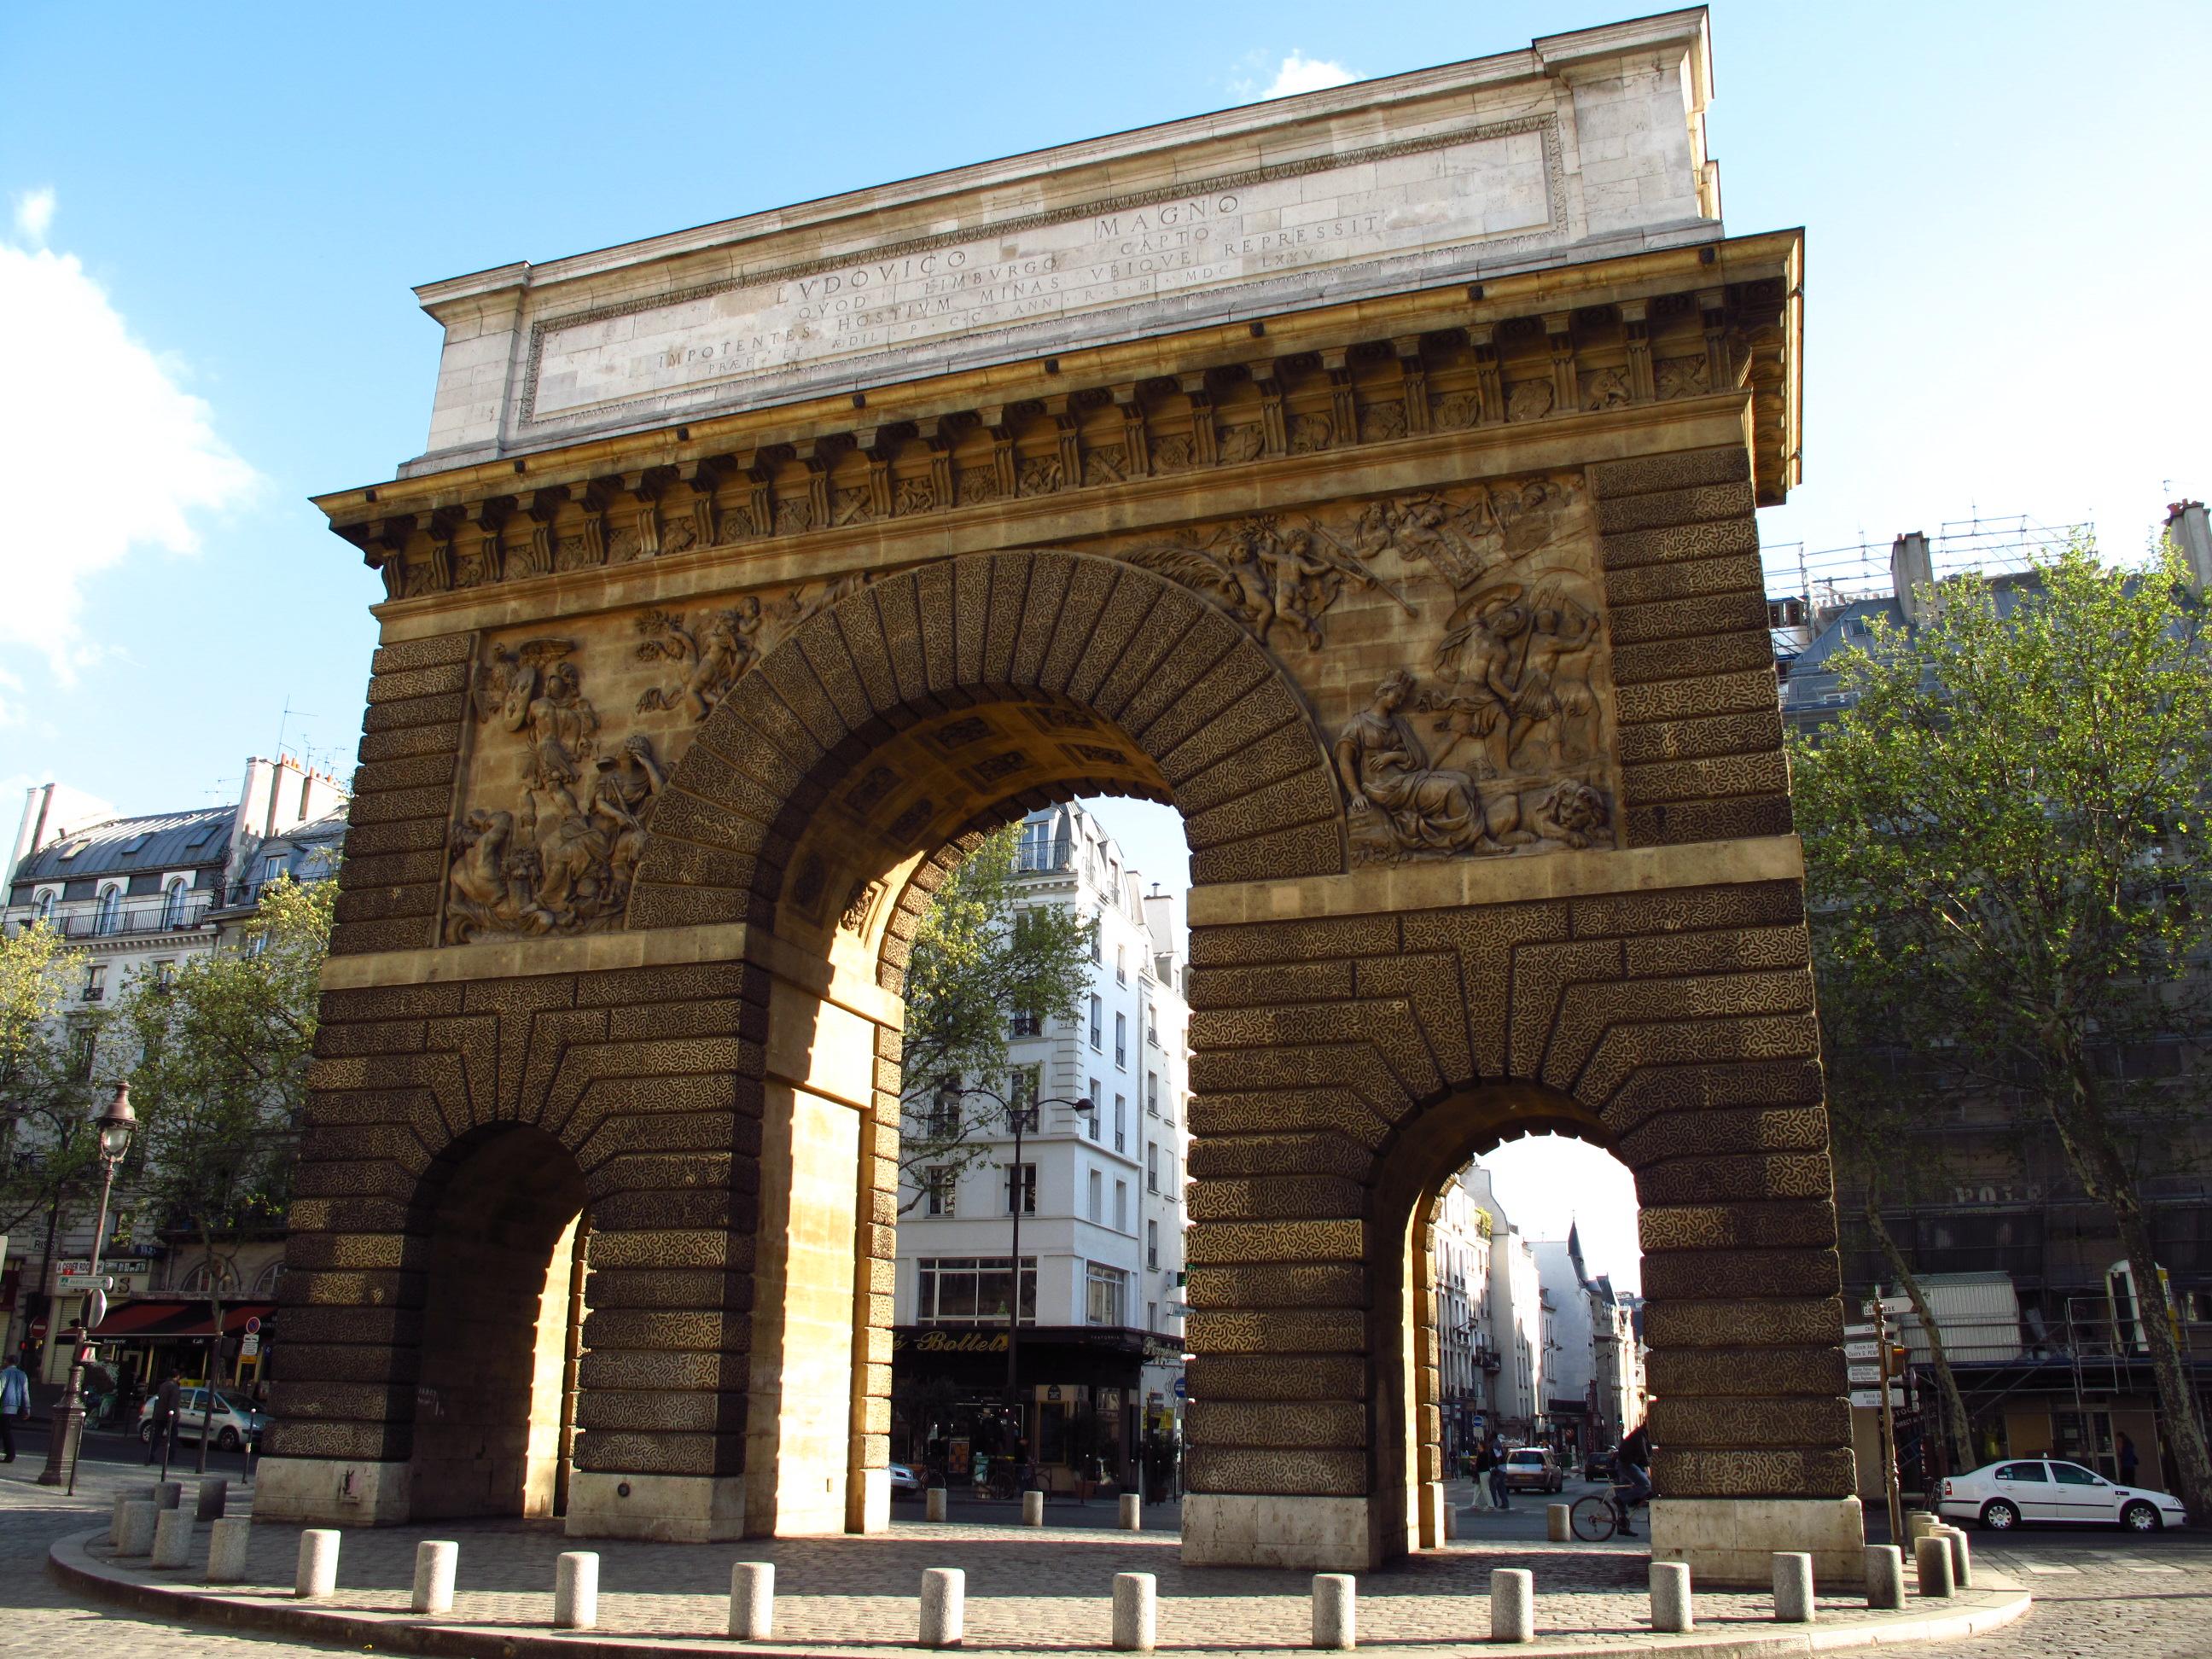 Porte saint martin - Petit theatre de la porte saint martin ...